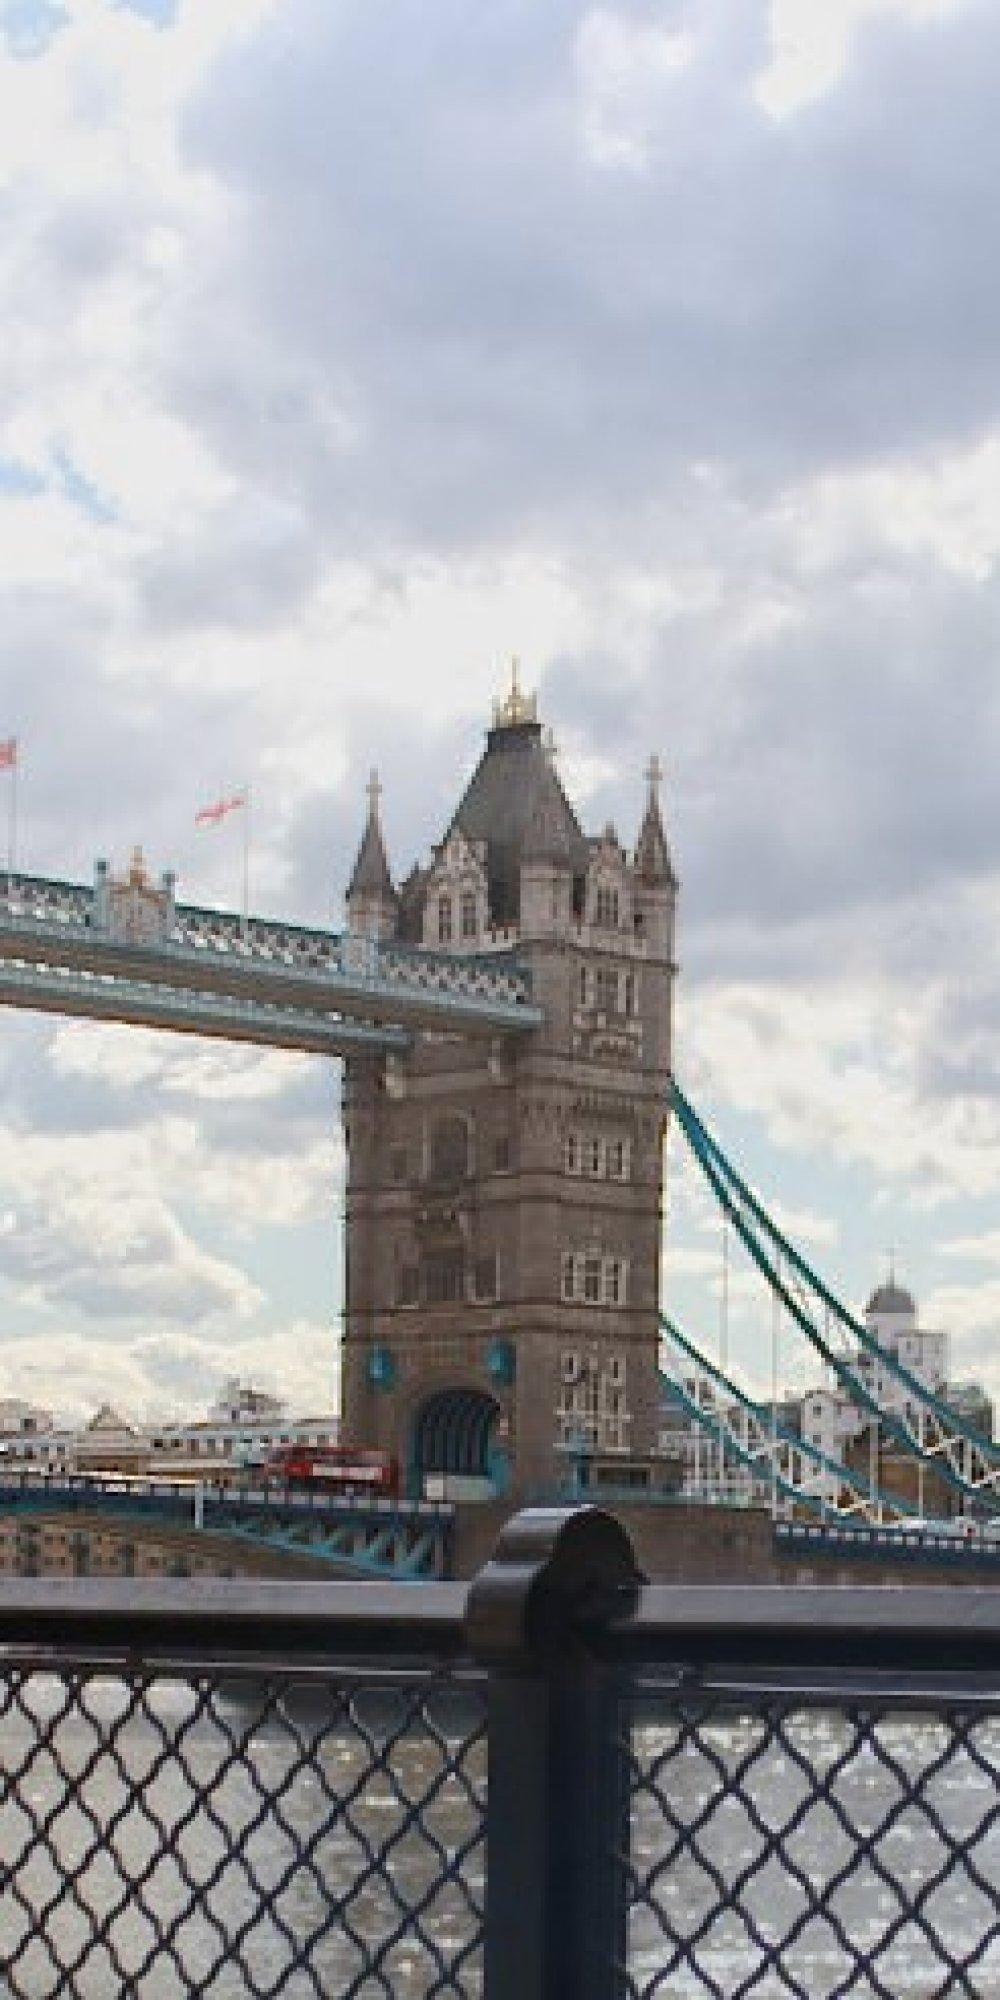 london tipps Sehenswürdigkeiten städtereise kurztrip sightseeing London geheimtipps must see